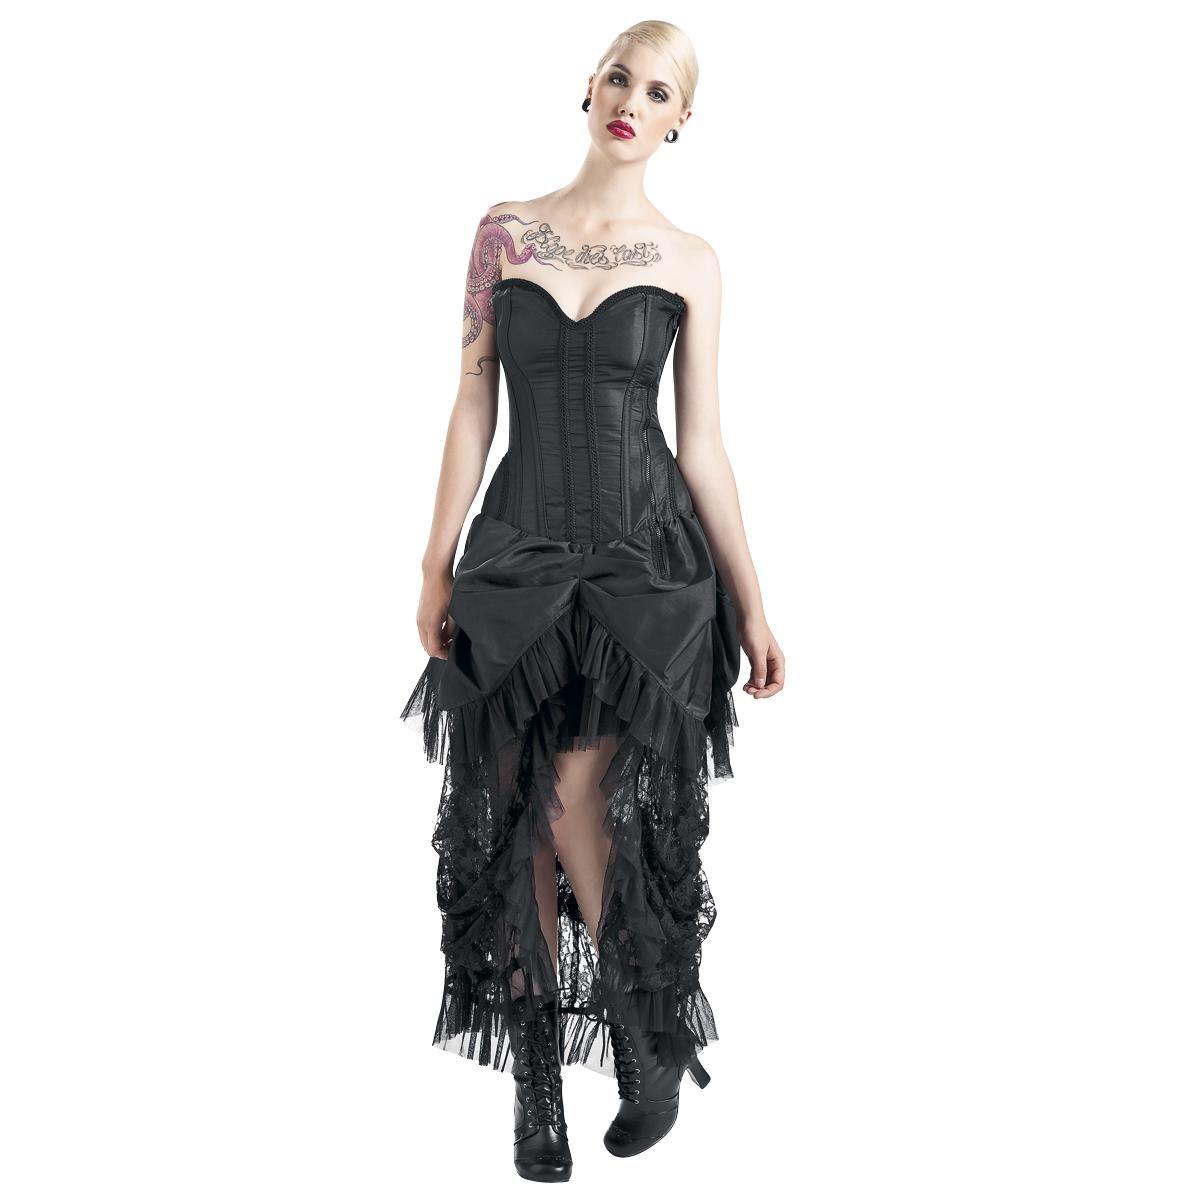 Elvira - Dress by Burleska - Article Number: 240606 - from 85.99 ...